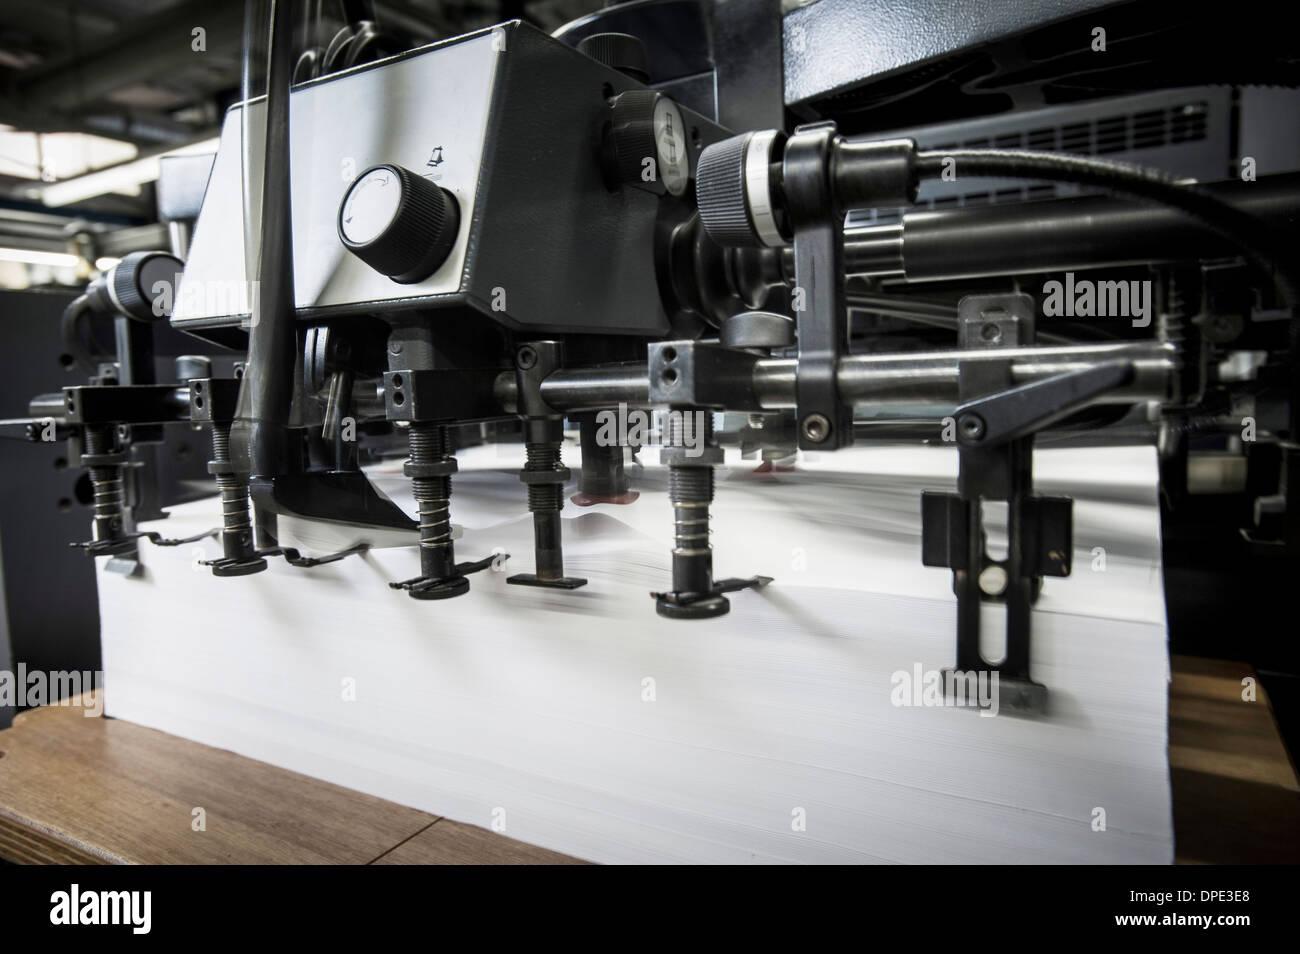 Paper prepared in printing machine in print workshop - Stock Image